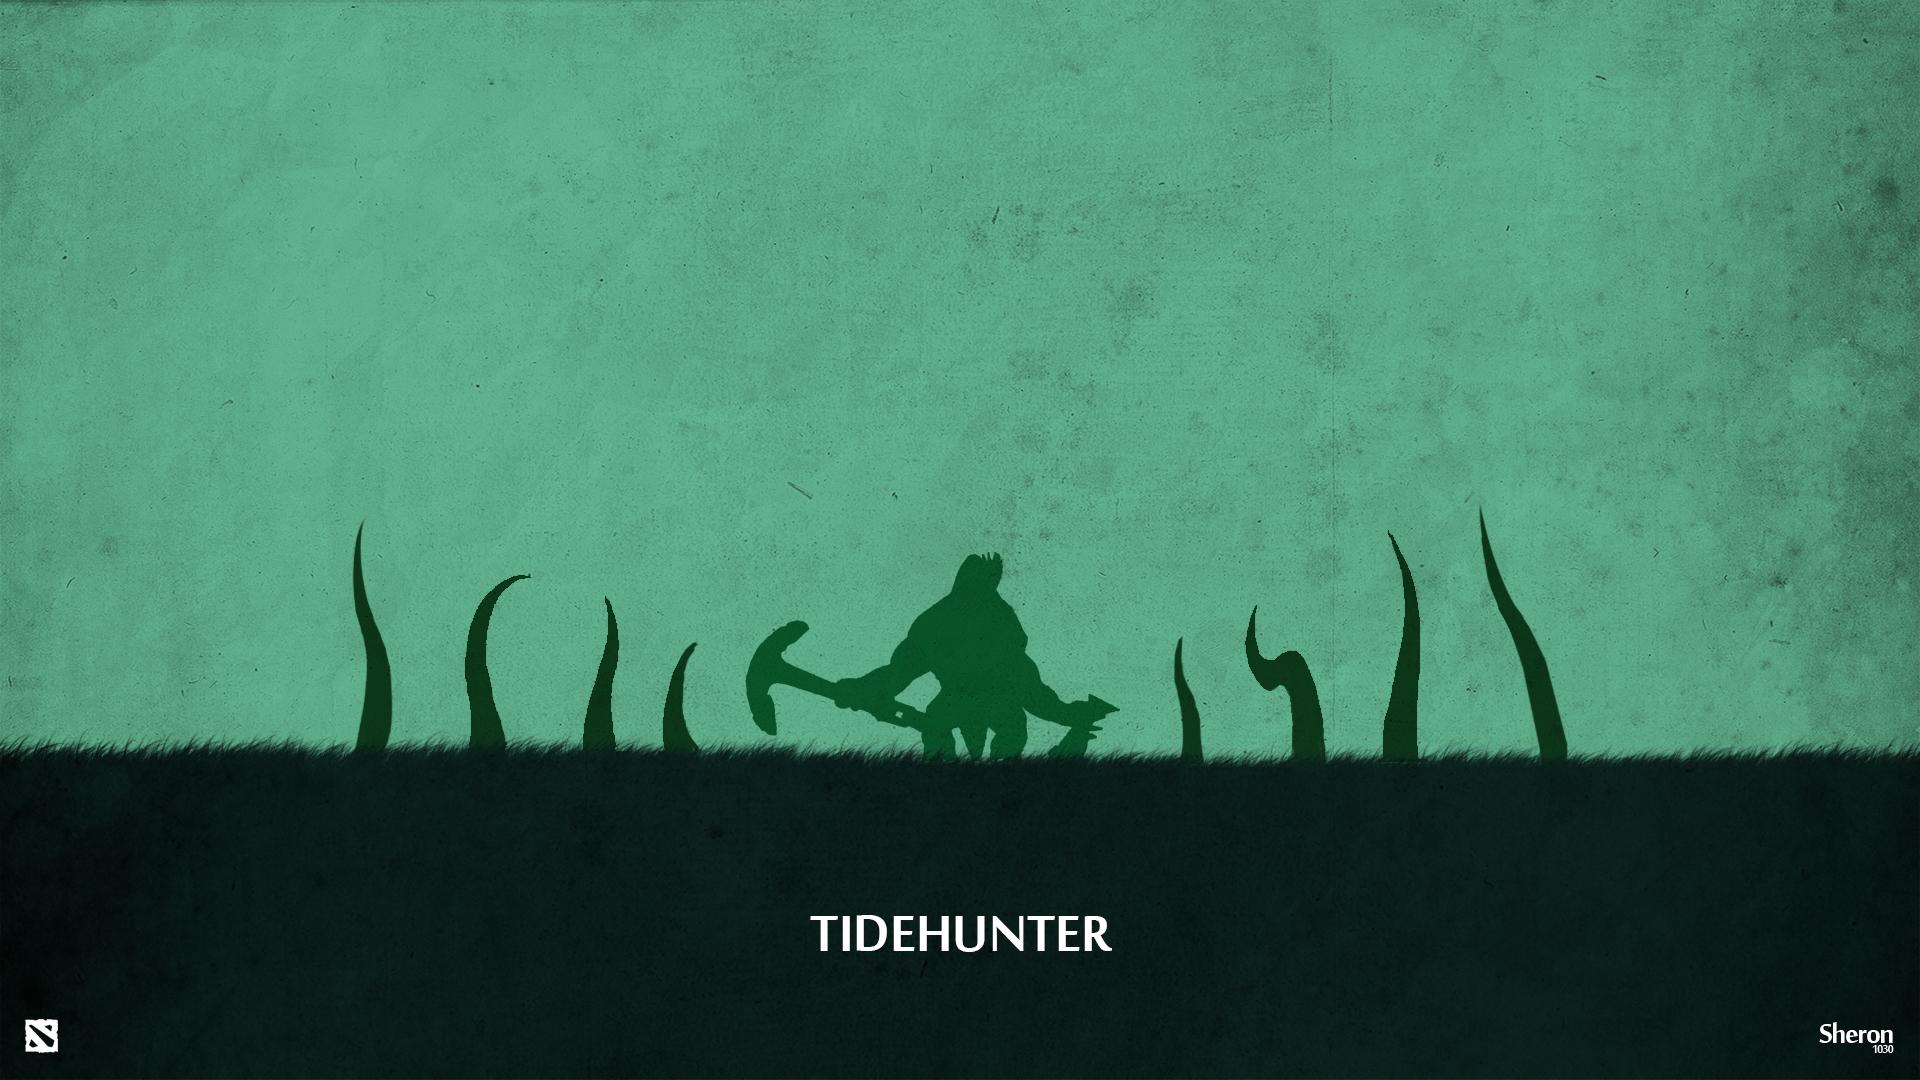 Dota 2   Tidehunter Wallpaper by sheron1030 1920x1080